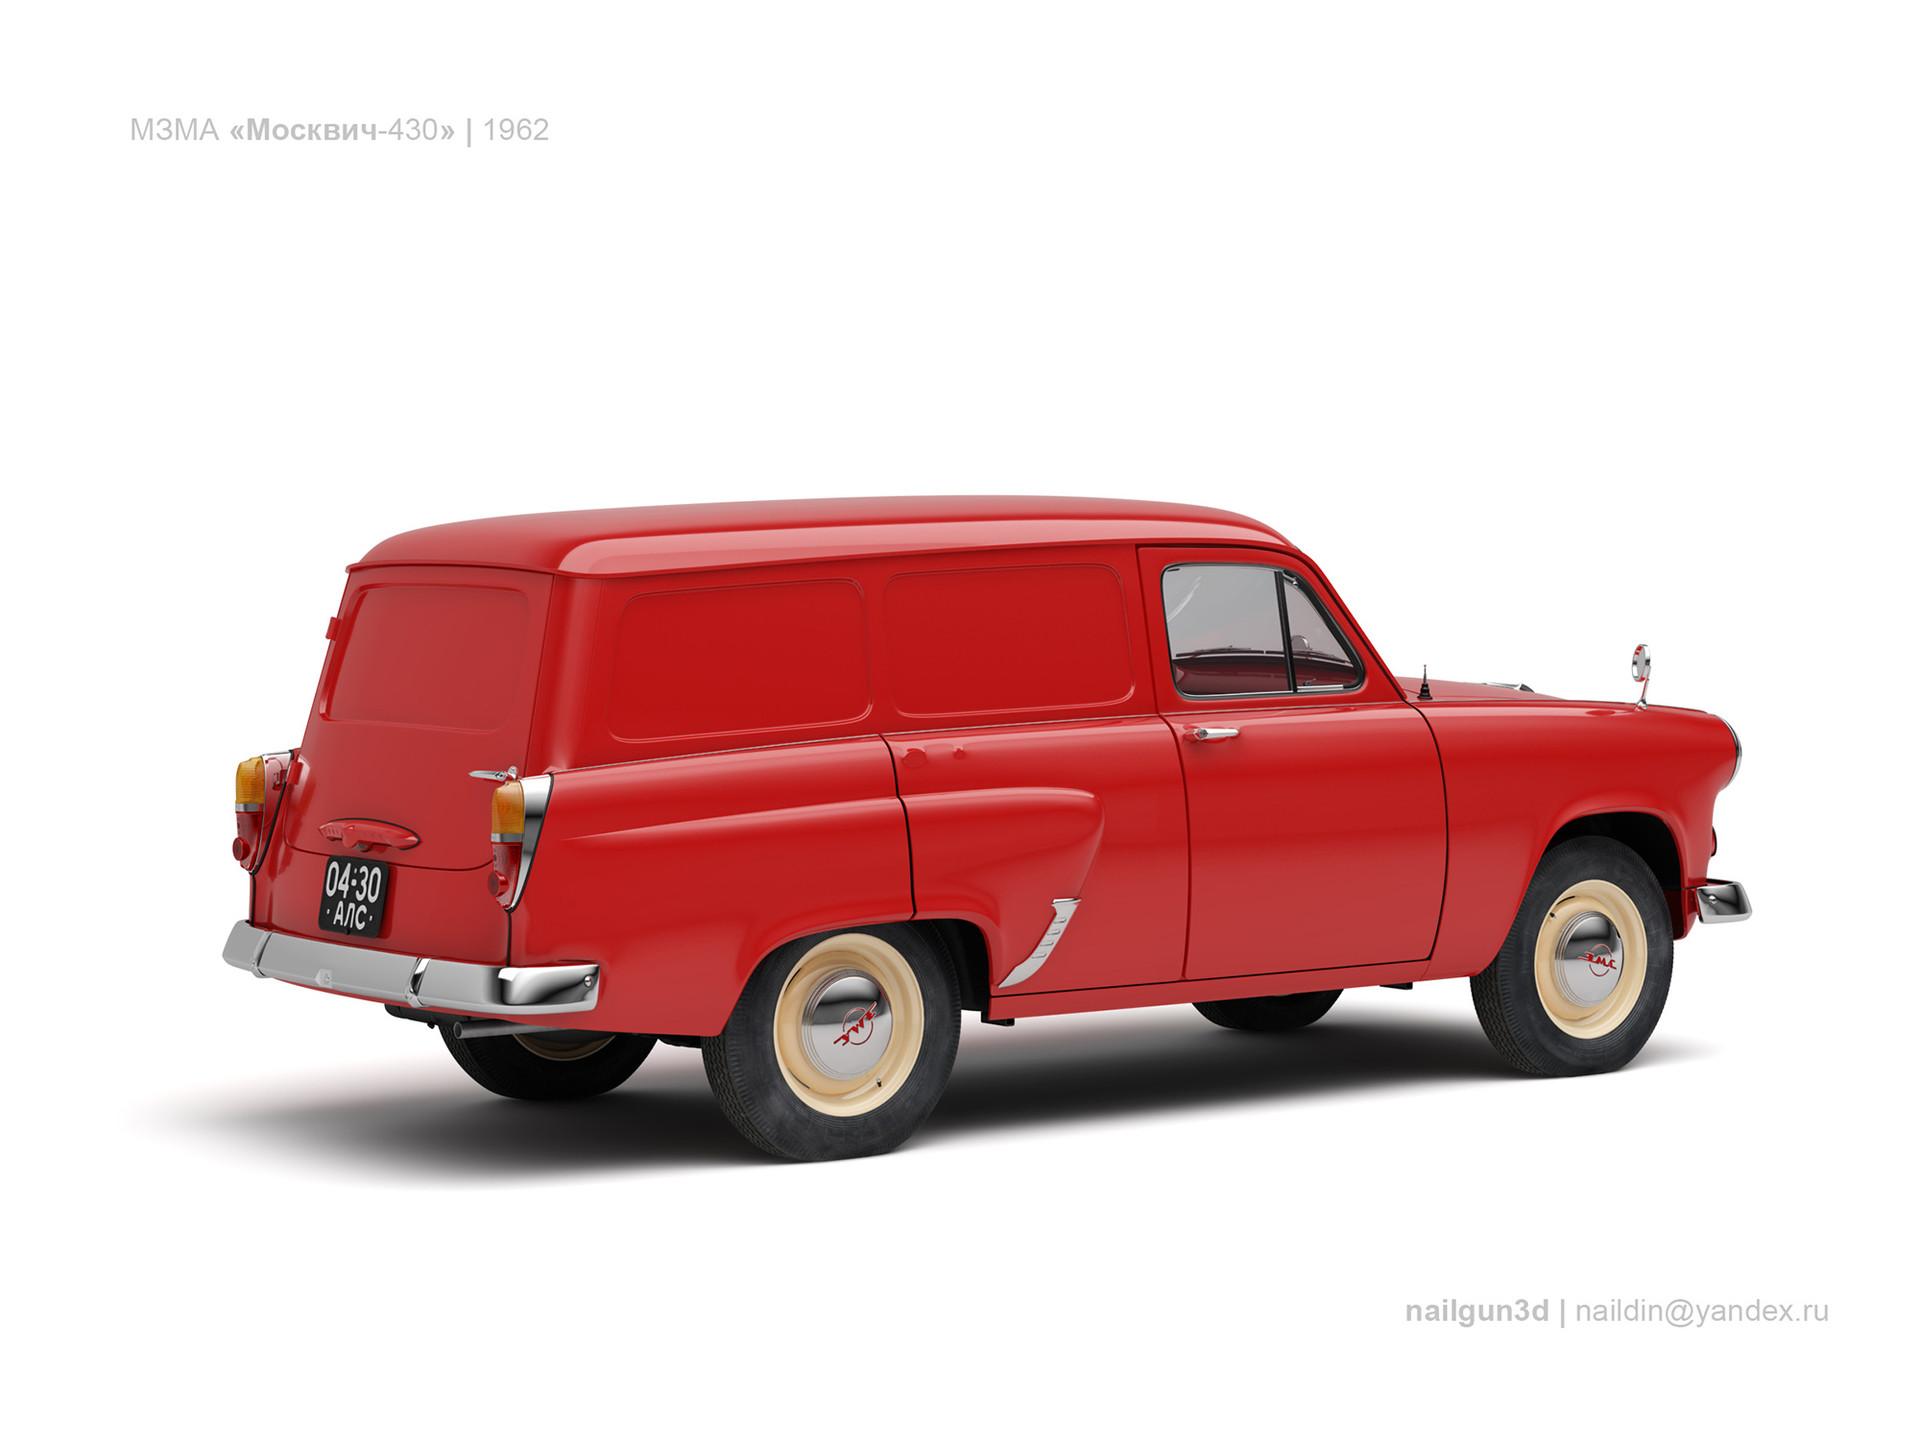 Nail khusnutdinov ussr moskvich 430 1962 1